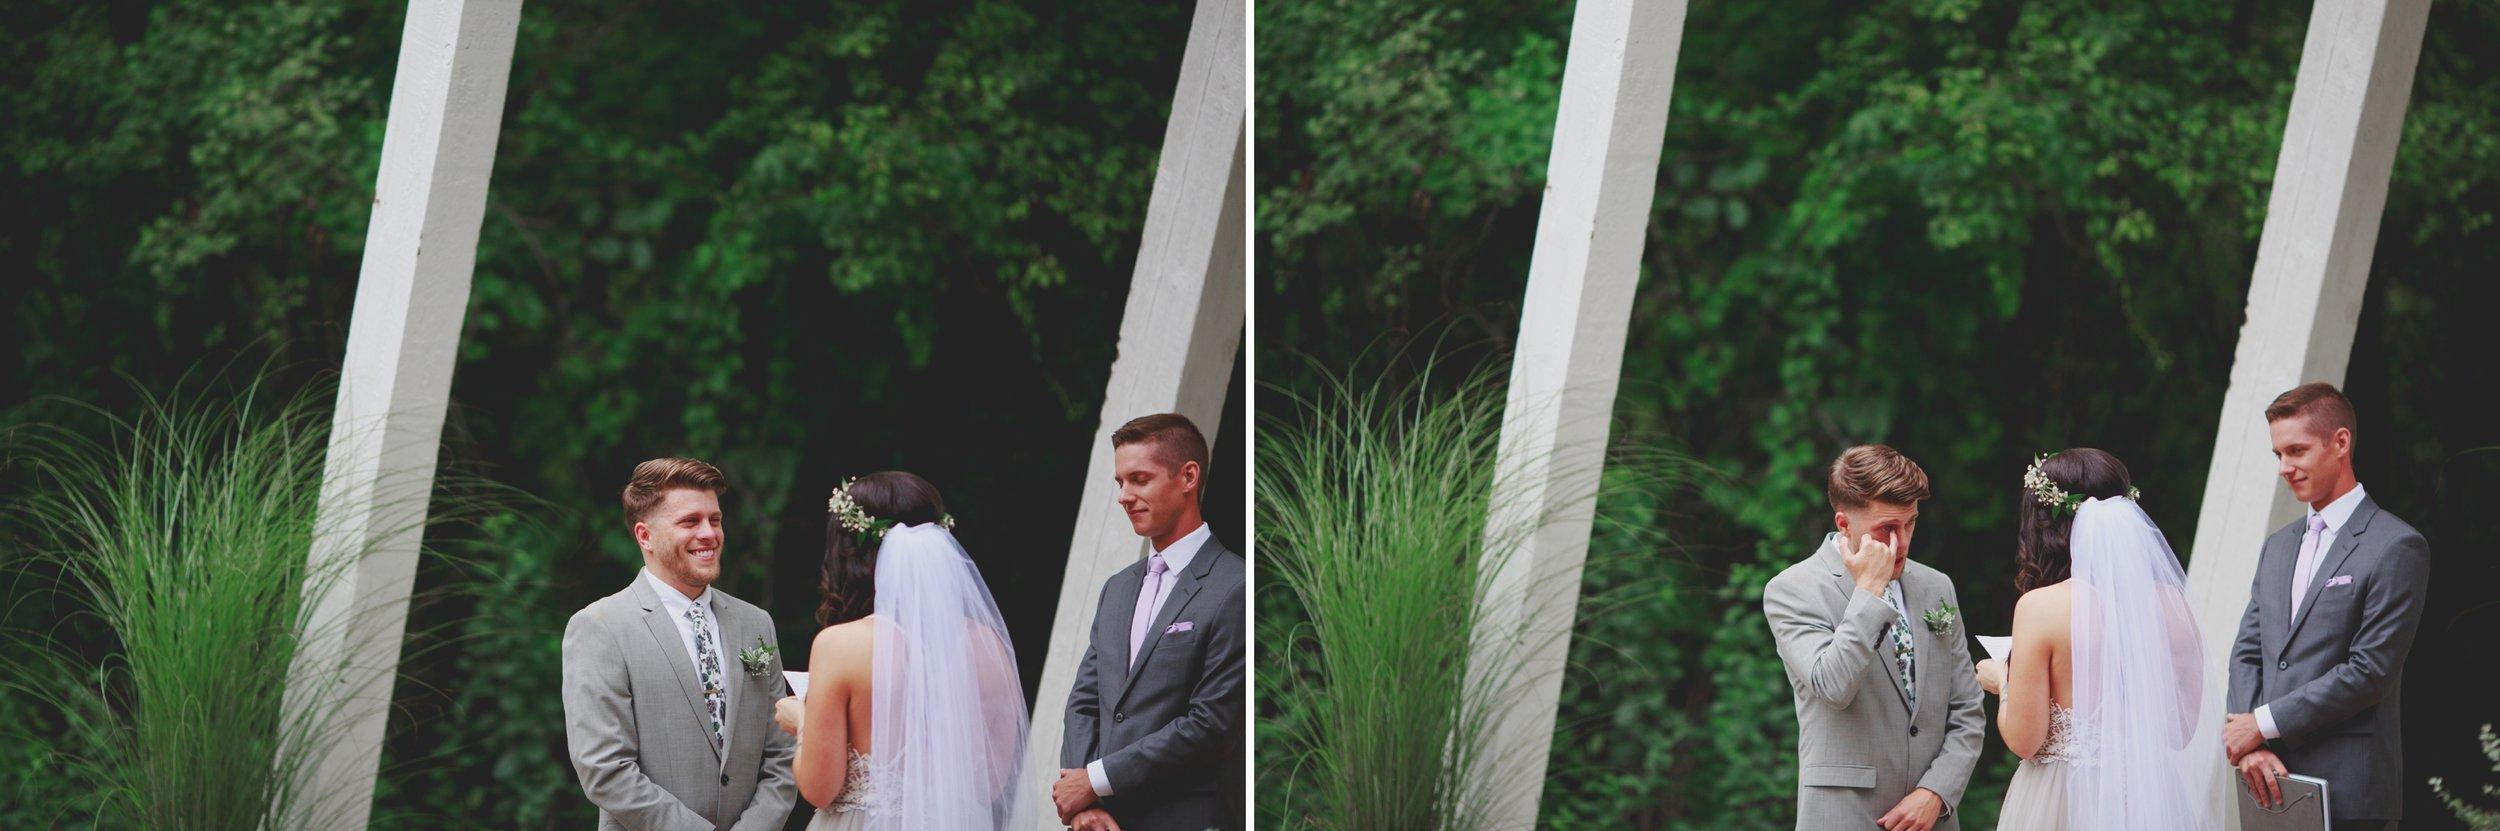 amanda_vanvels_michigan_camp_wedding_095.jpg